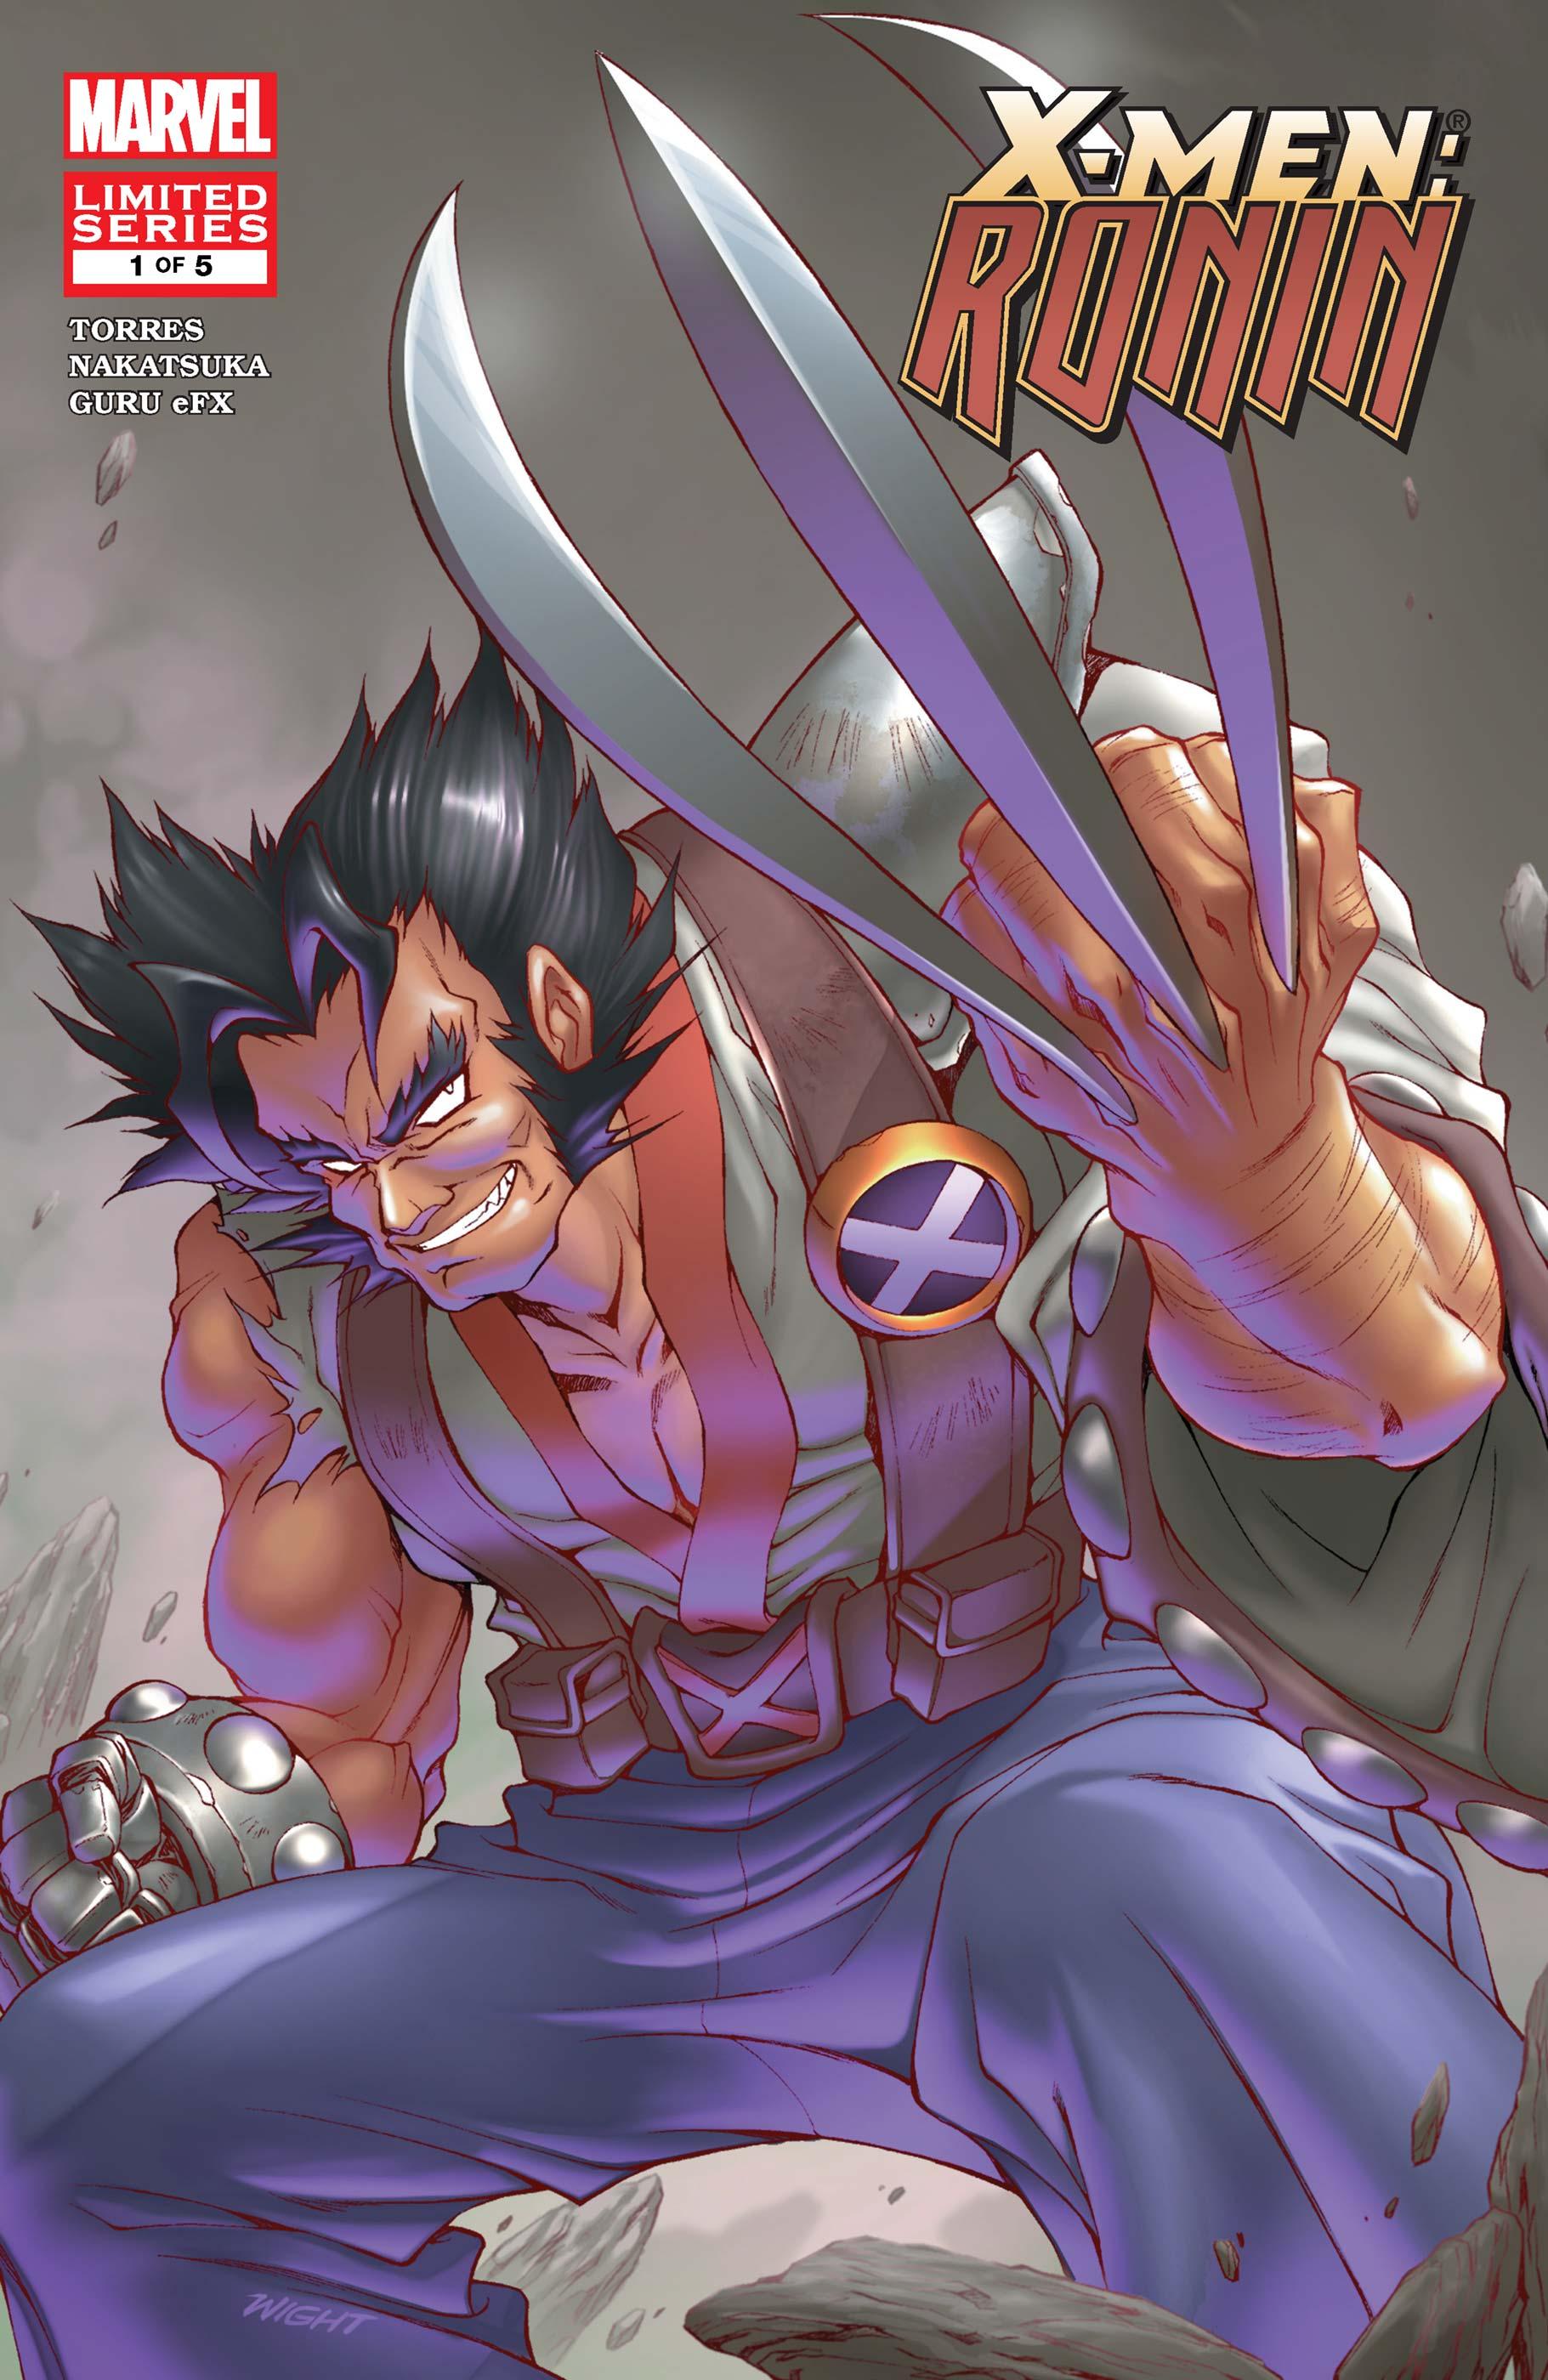 X-Men: Ronin (2003) #1